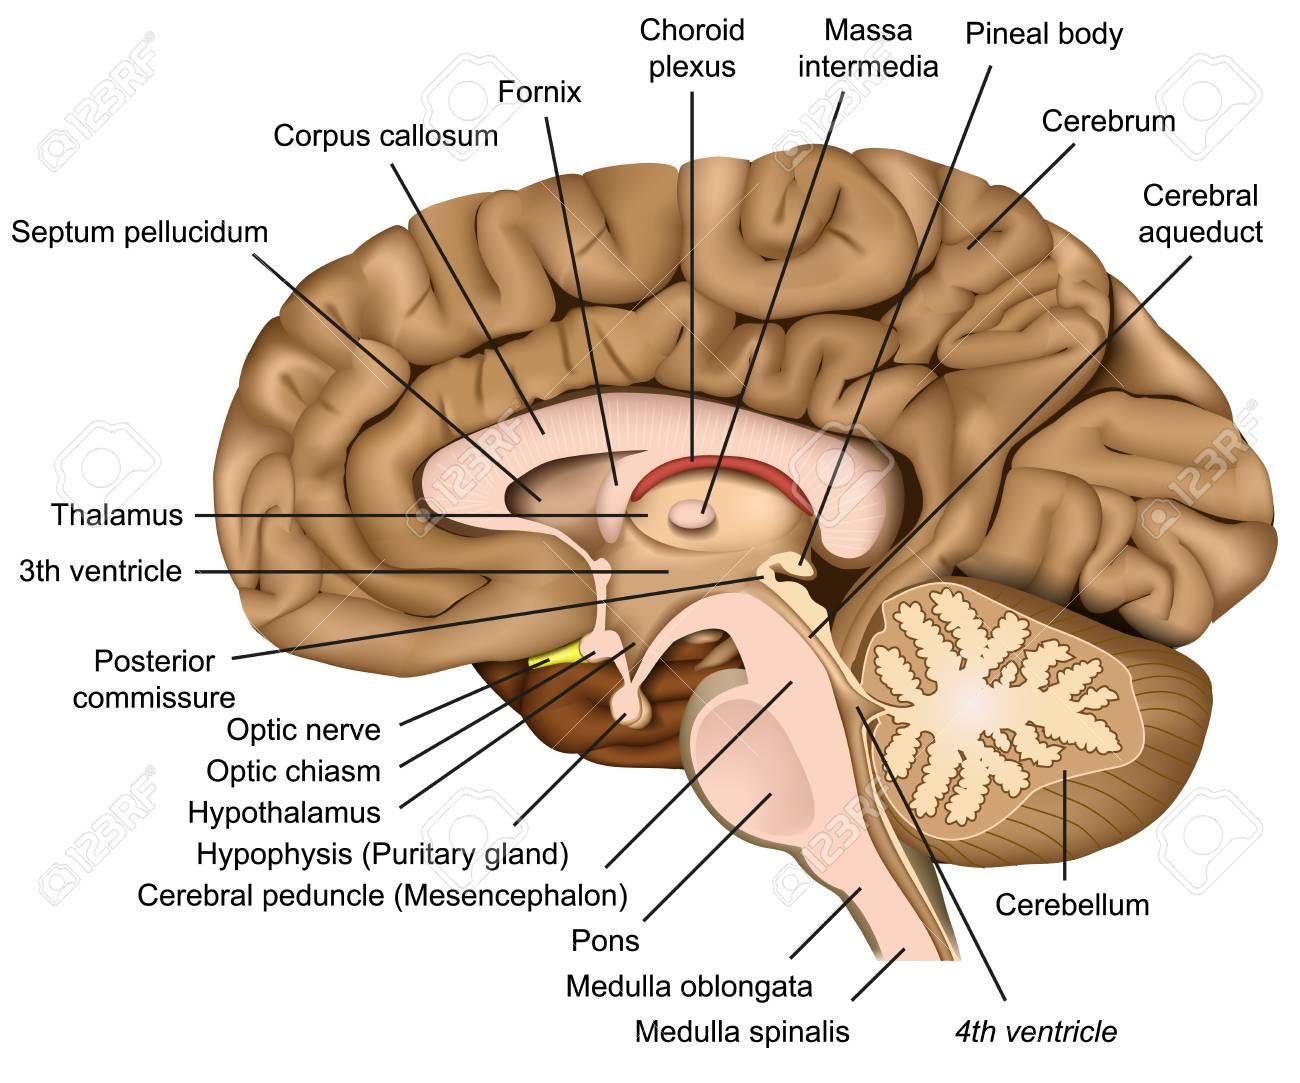 Human Brain Anatomy 3d Vector Illustration On White Background